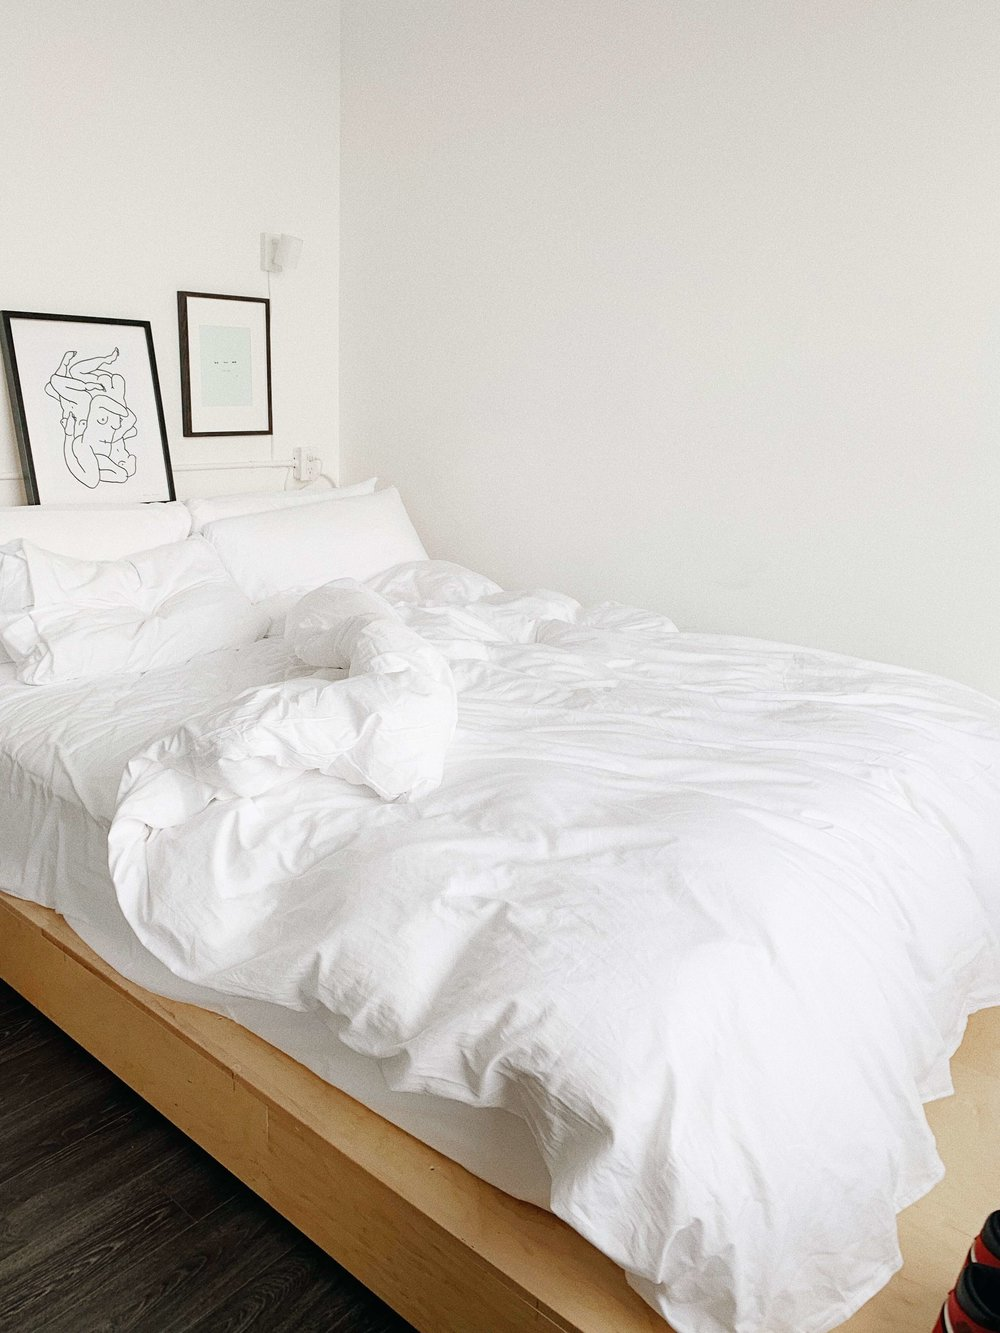 taraleighrose-annex-hotel-toronto-influencer-lifestyle-influencer-room (1).JPG